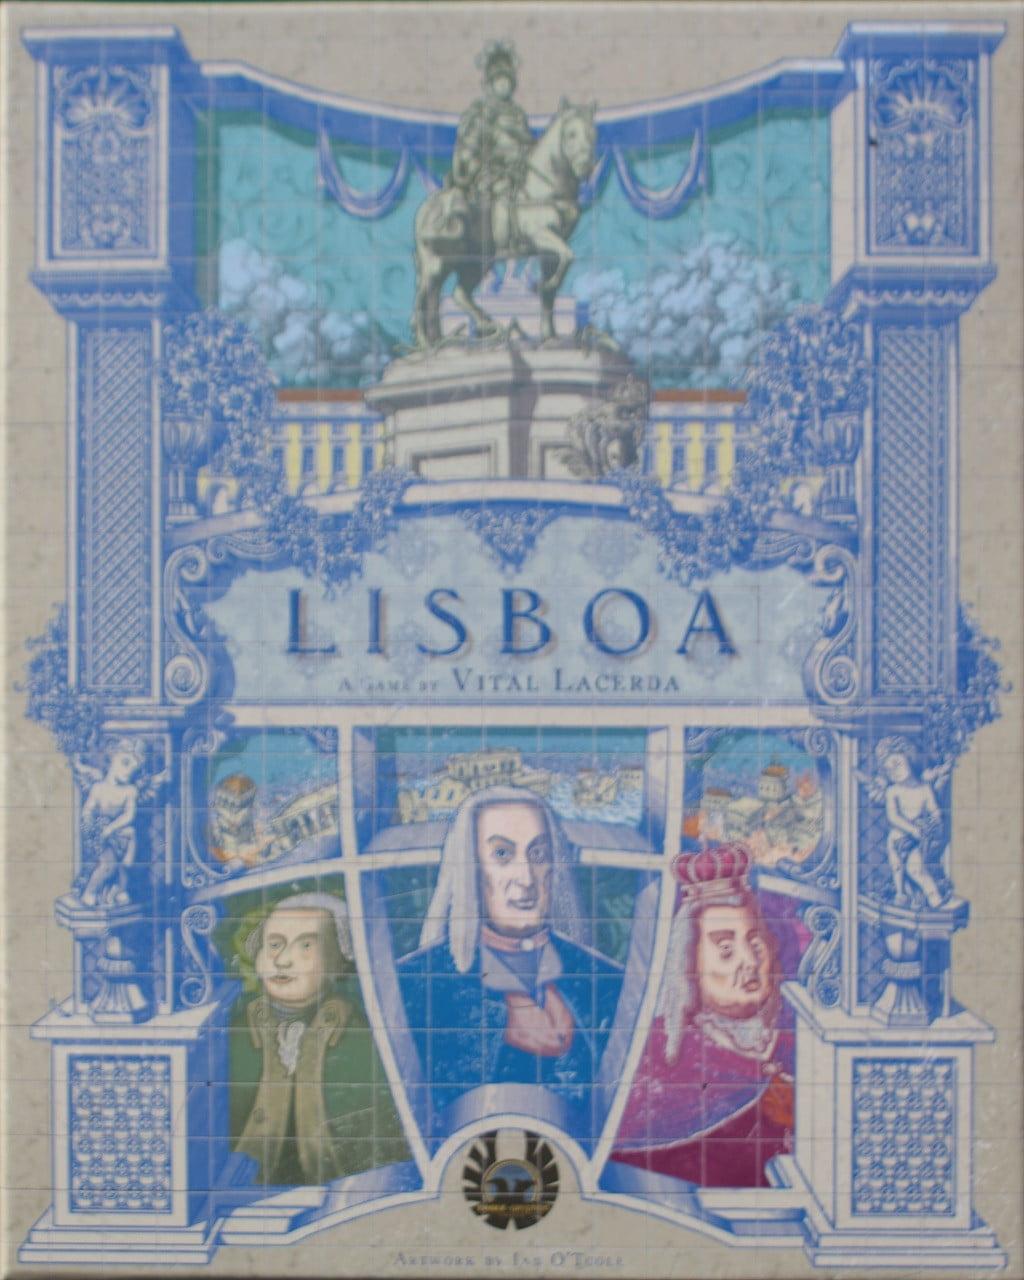 La scatola di Lisboa